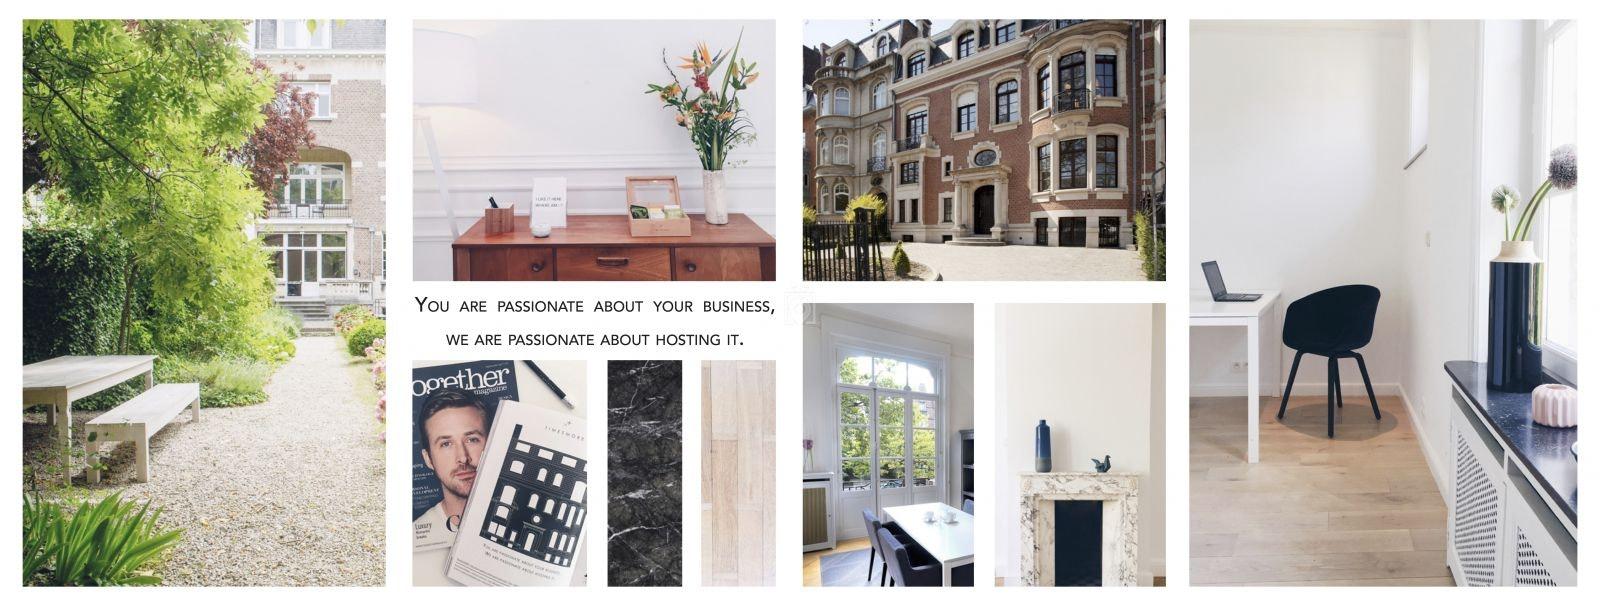 La Maison Du Monde Bilbao timesmore, brussels - book online - coworker